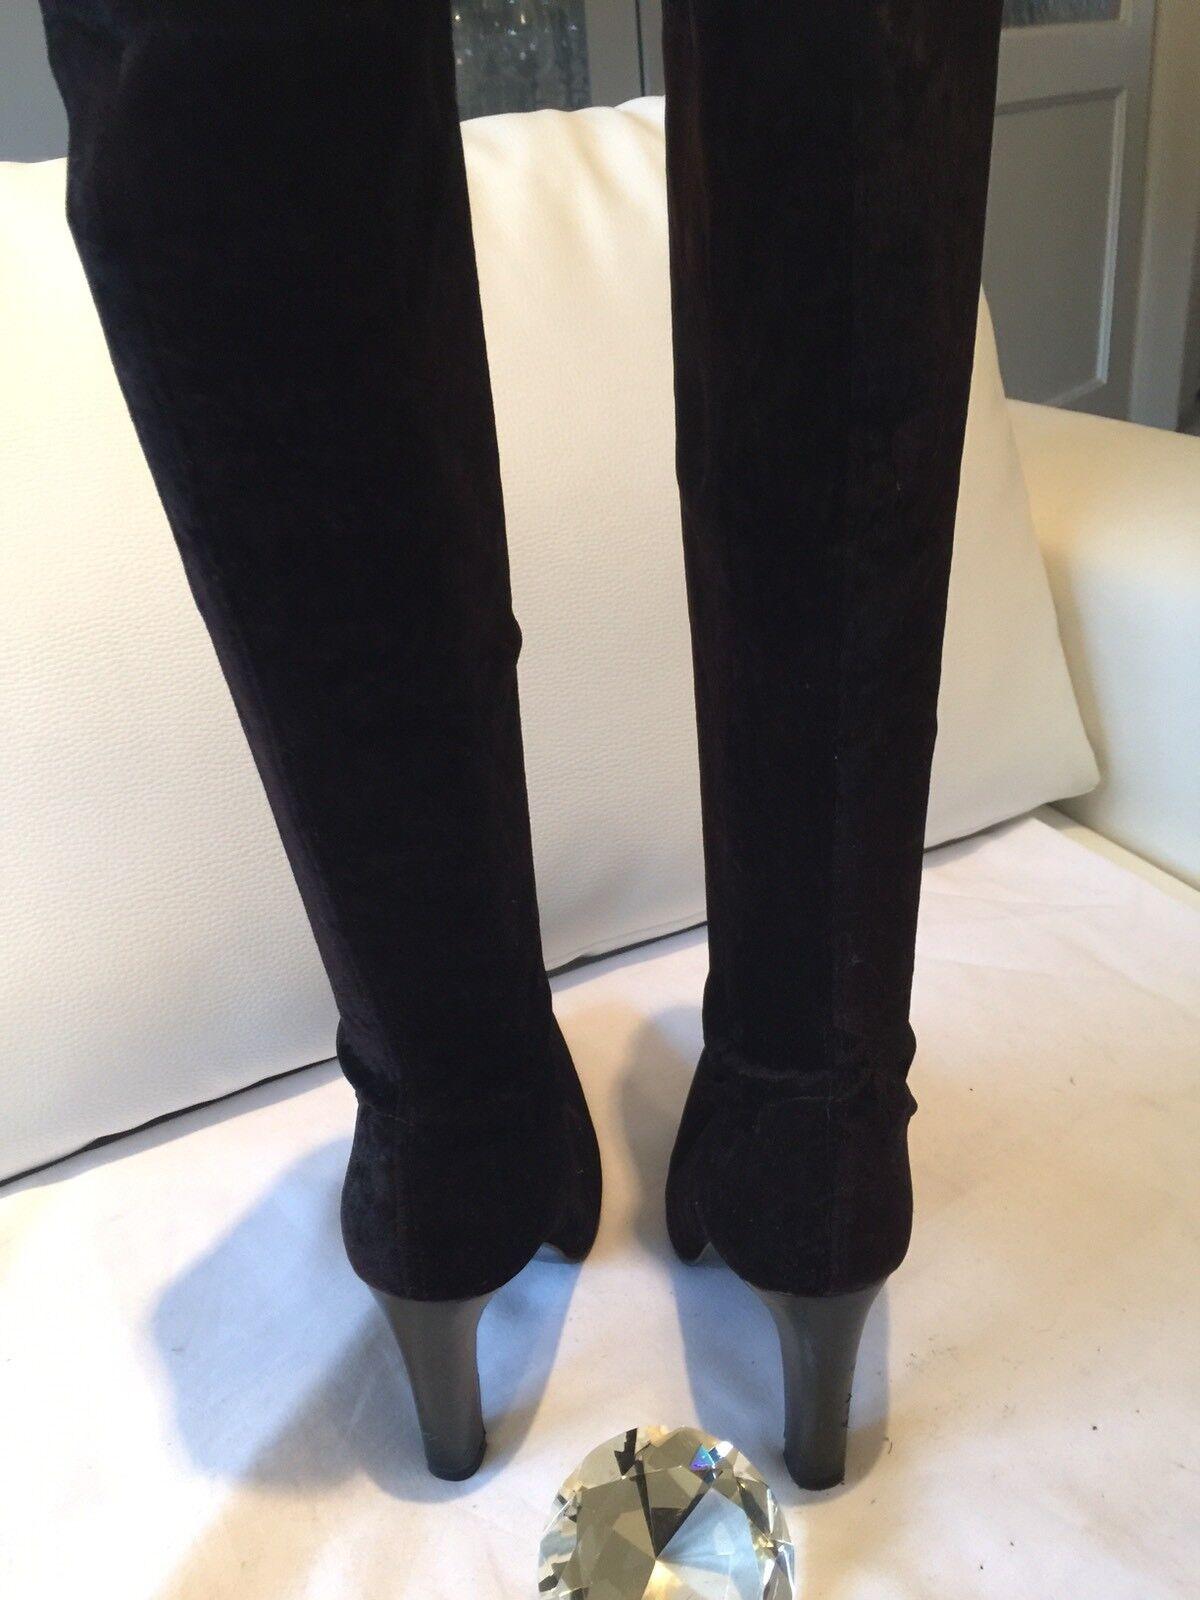 Schwarze Samtstiefel Stiefel High Heels Gr.37 Gr.37 Gr.37 NEU  | Bestellung willkommen  | Sale Outlet  00d3b2